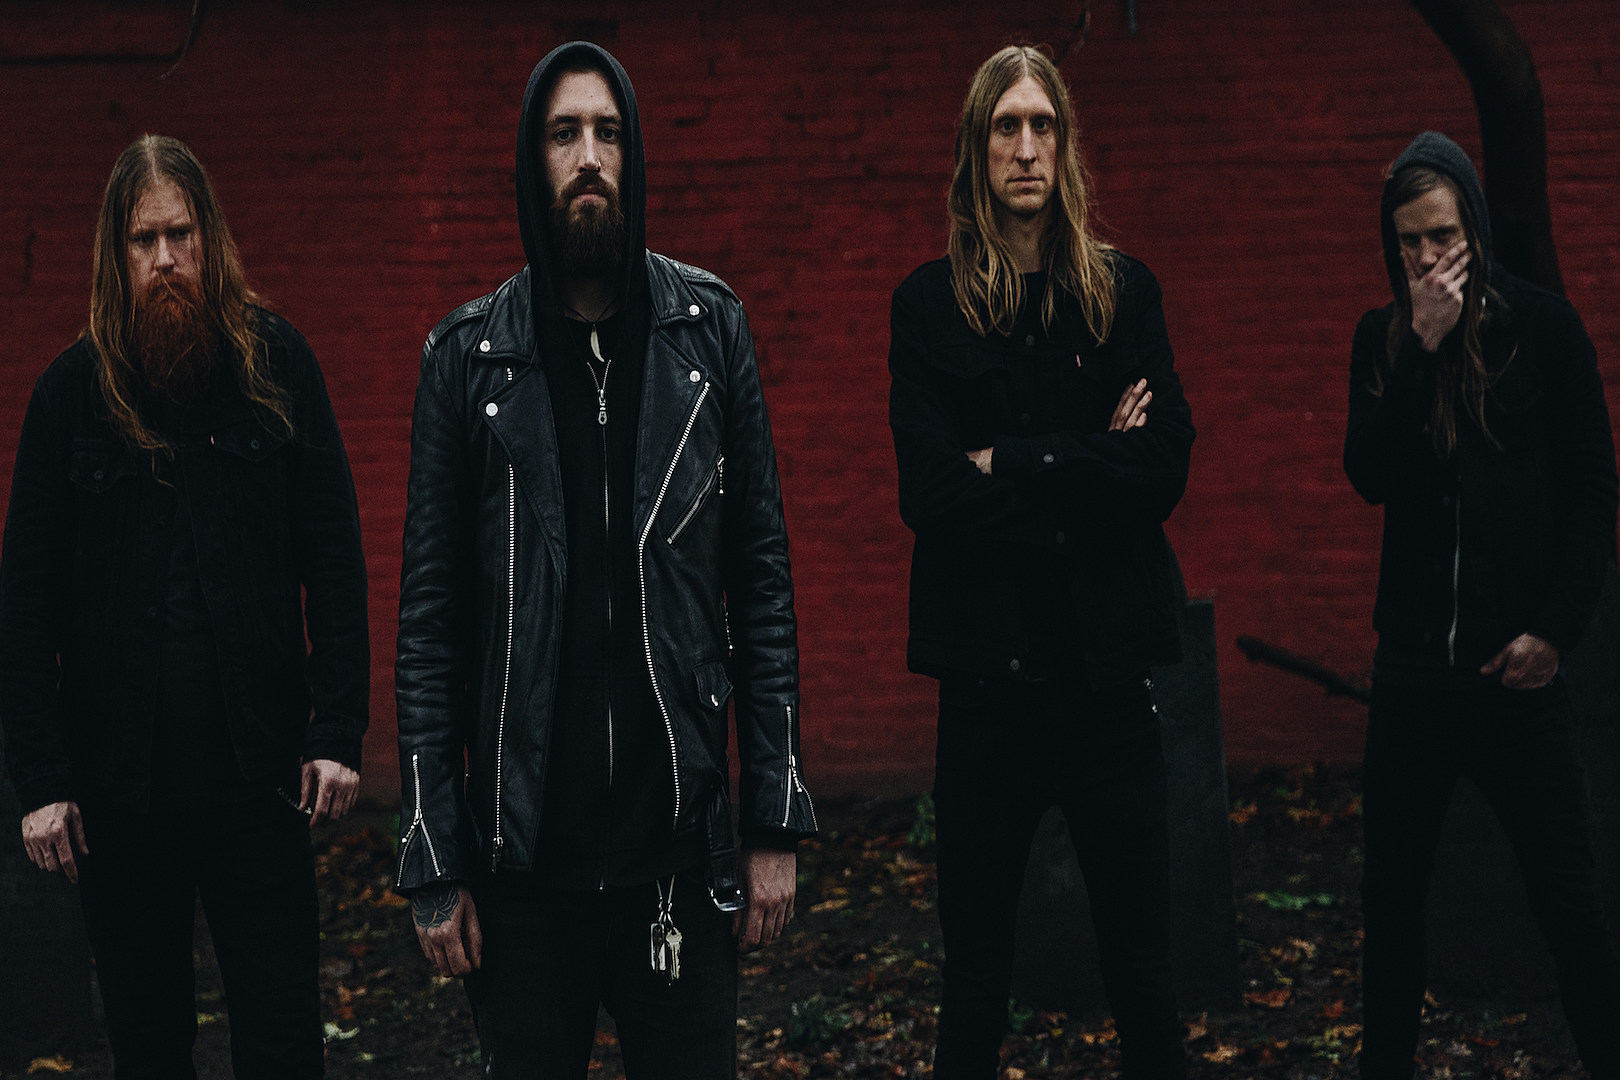 Skeletonwitch Return With 'Devouring Radiant Light' Album + New Single 'Fen of Shadows'